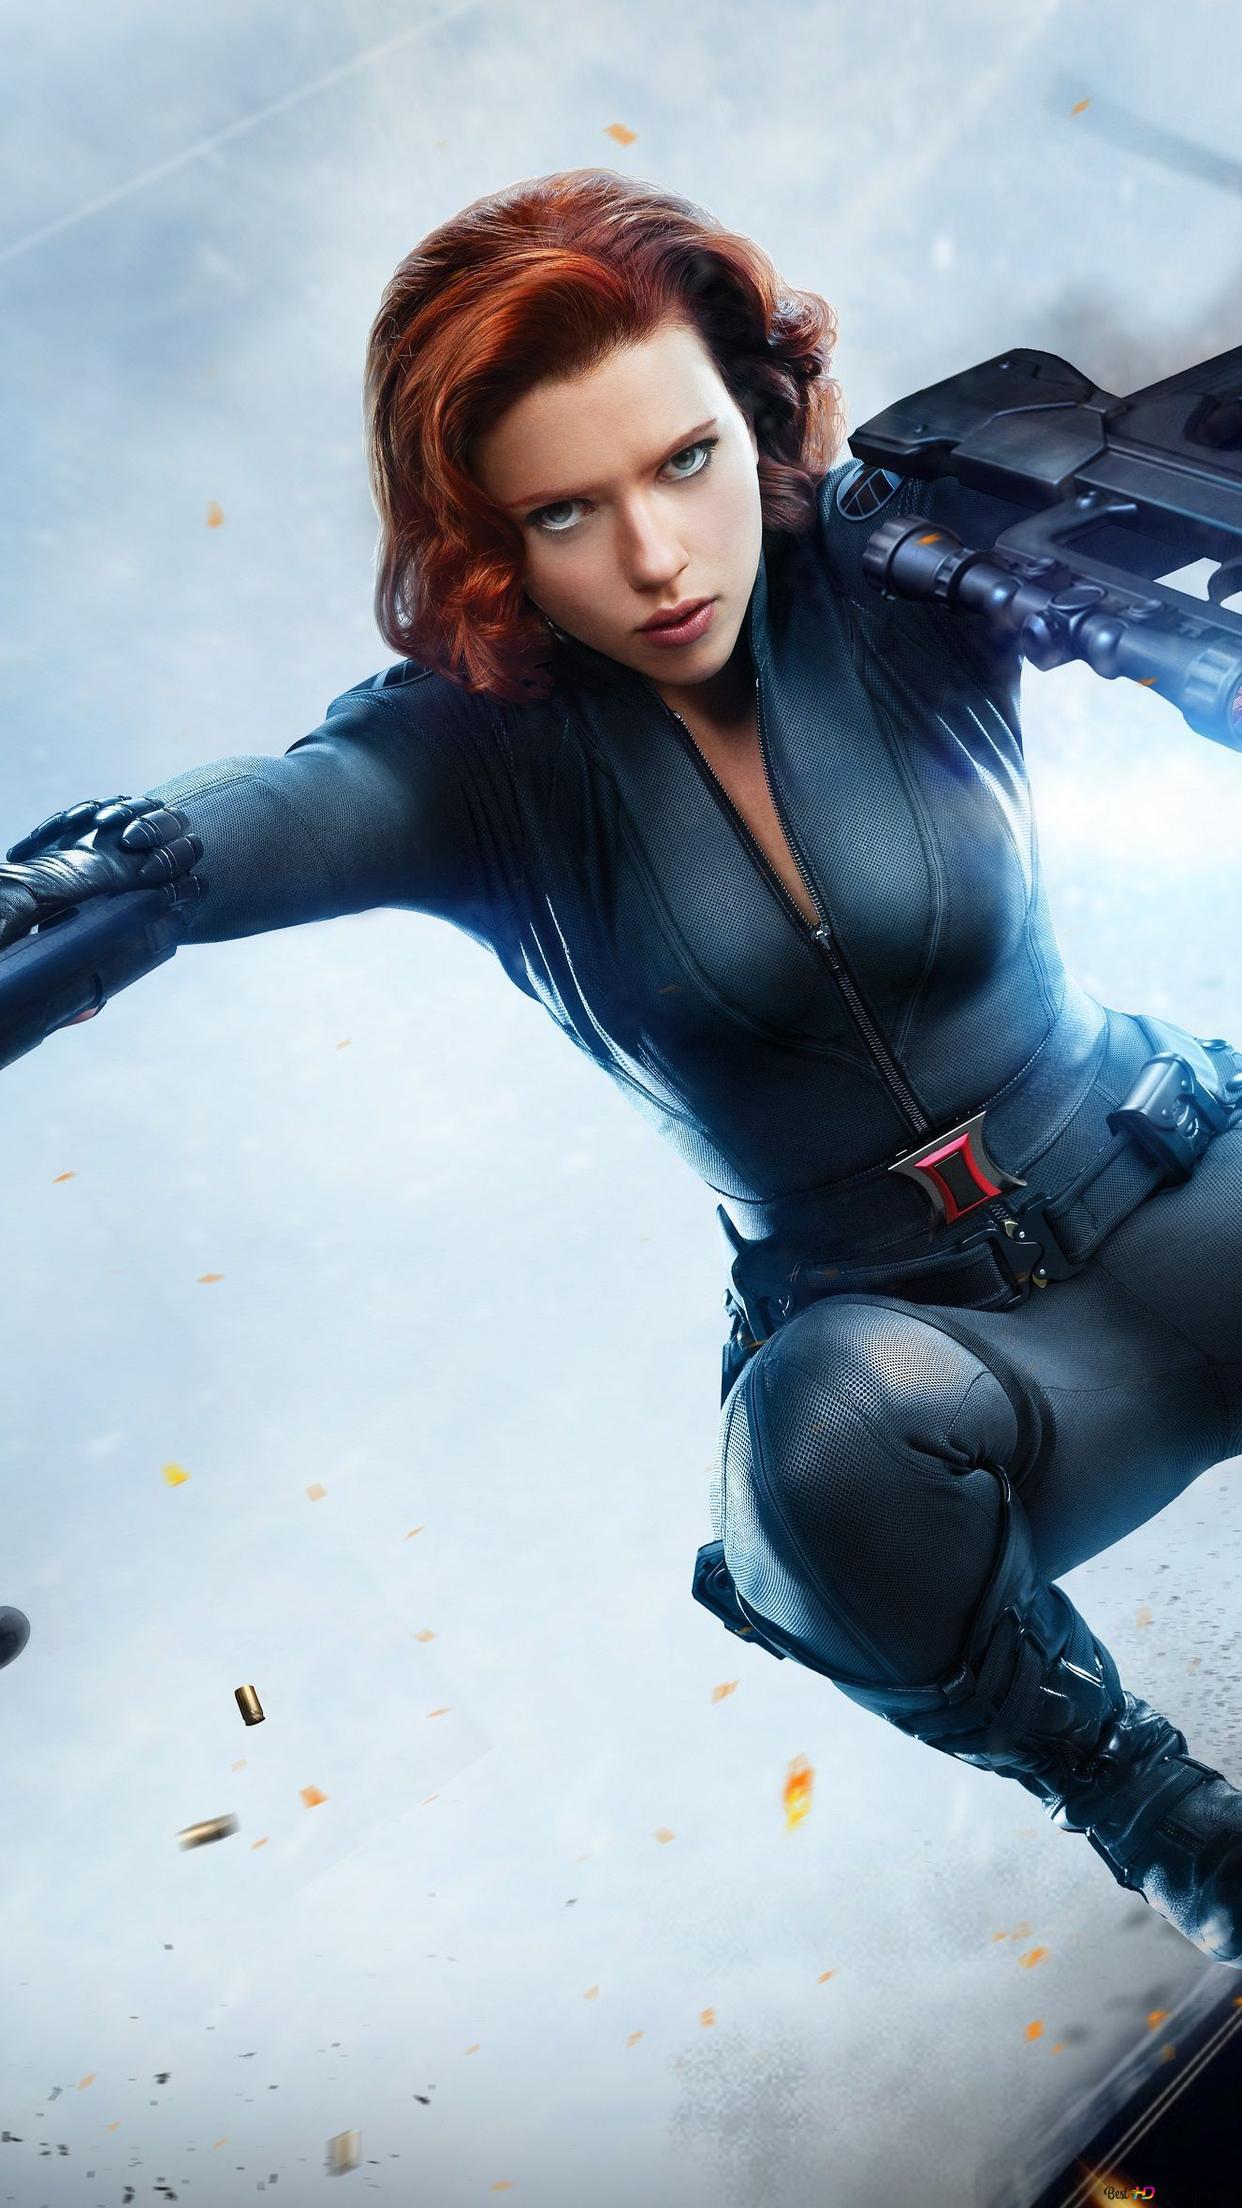 Black Widow Movie 2020 HD wallpaper download